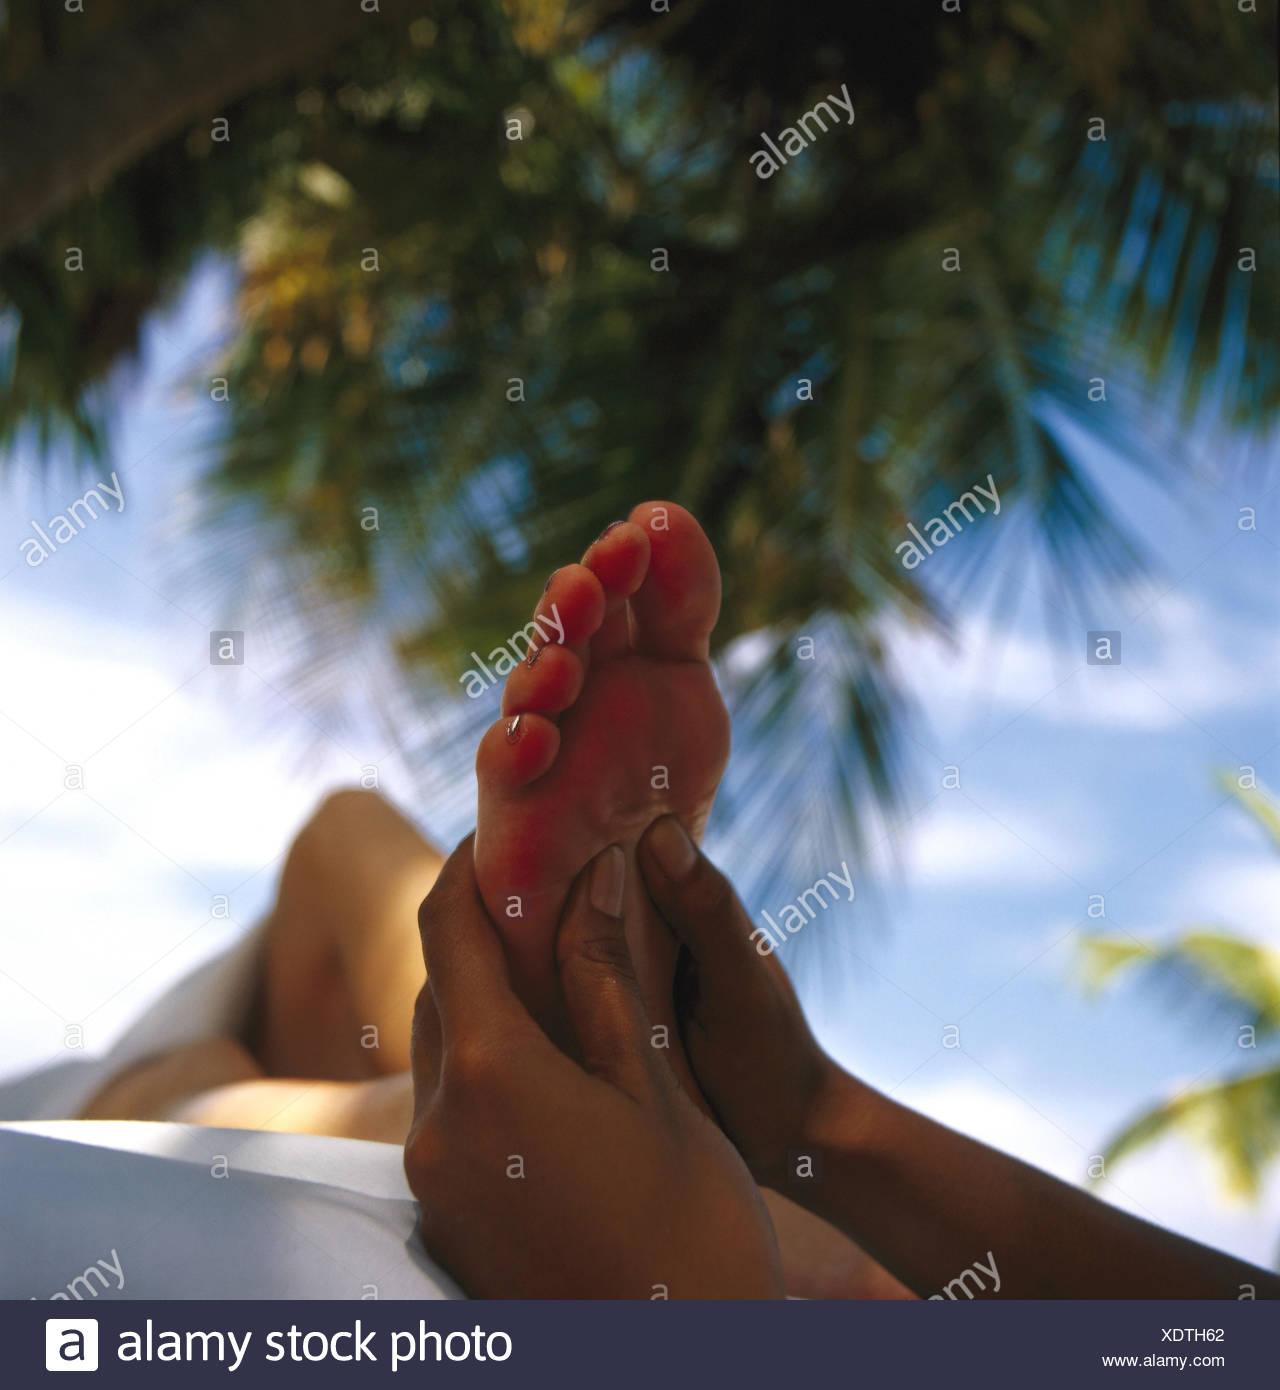 Palm beach, woman, locals, foot massage, detail, massage